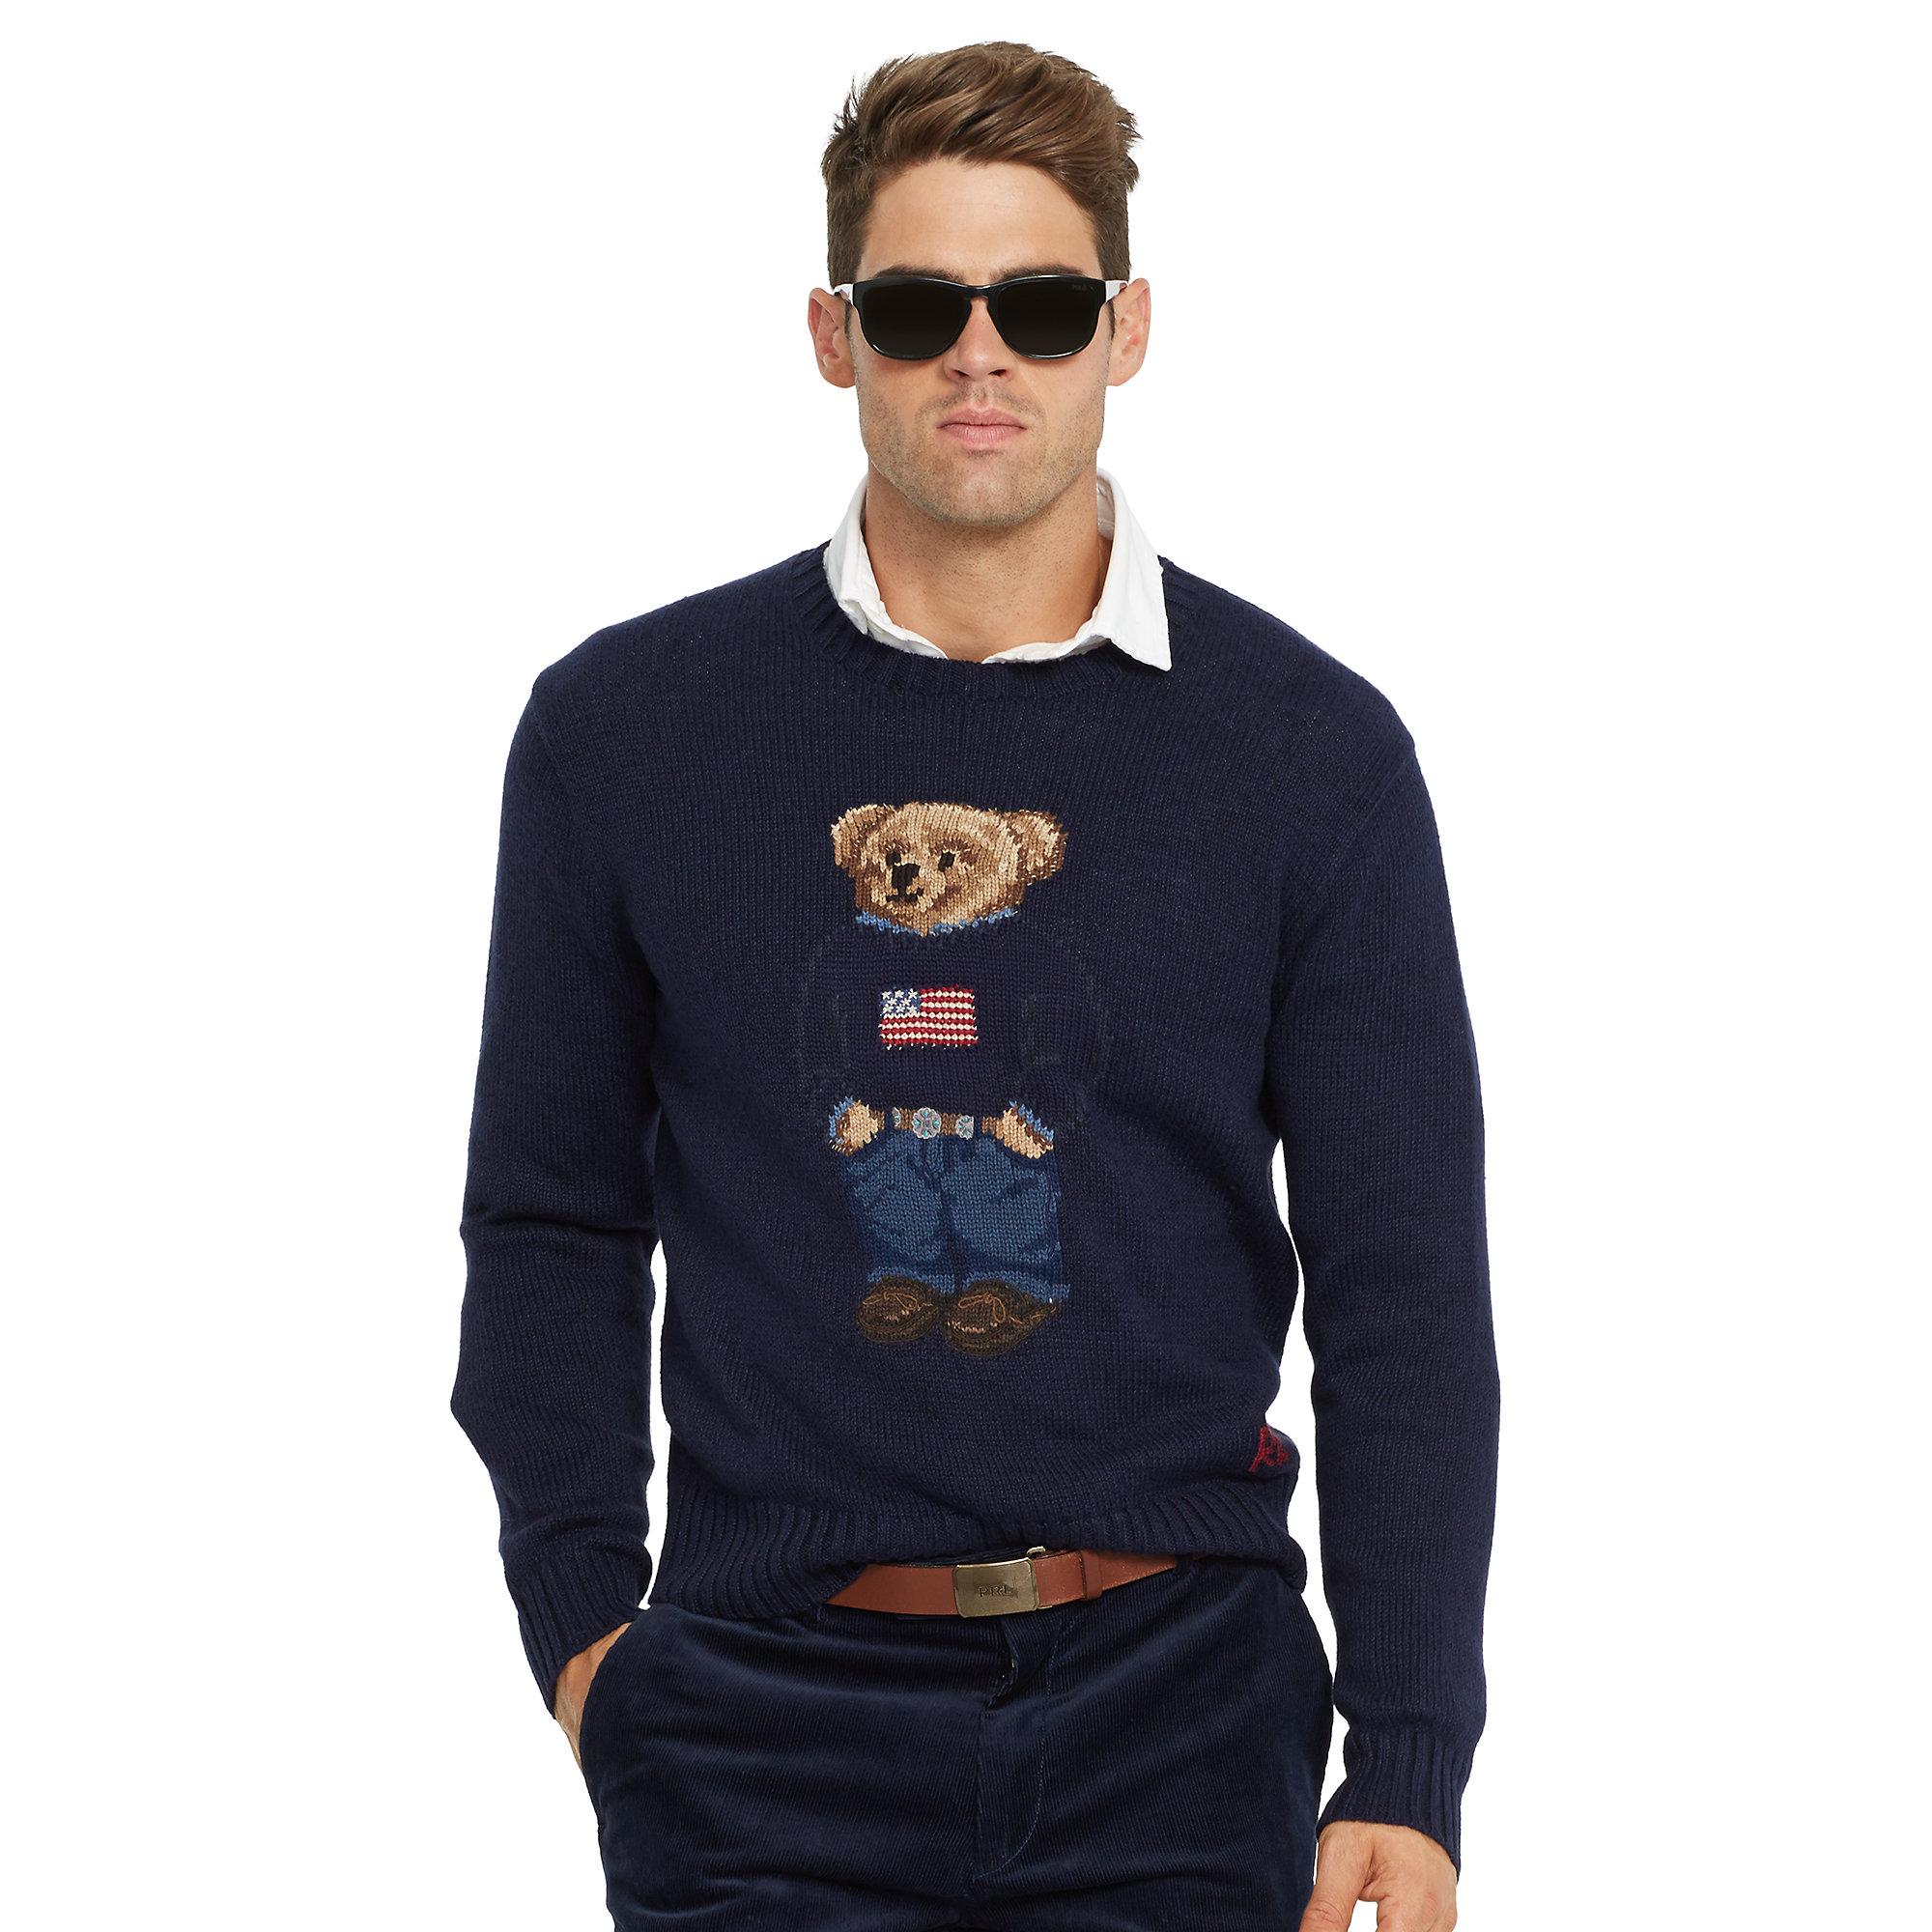 4a27a8266fe7 Lyst - Polo Ralph Lauren Flag Polo Bear Sweater in Blue for Men